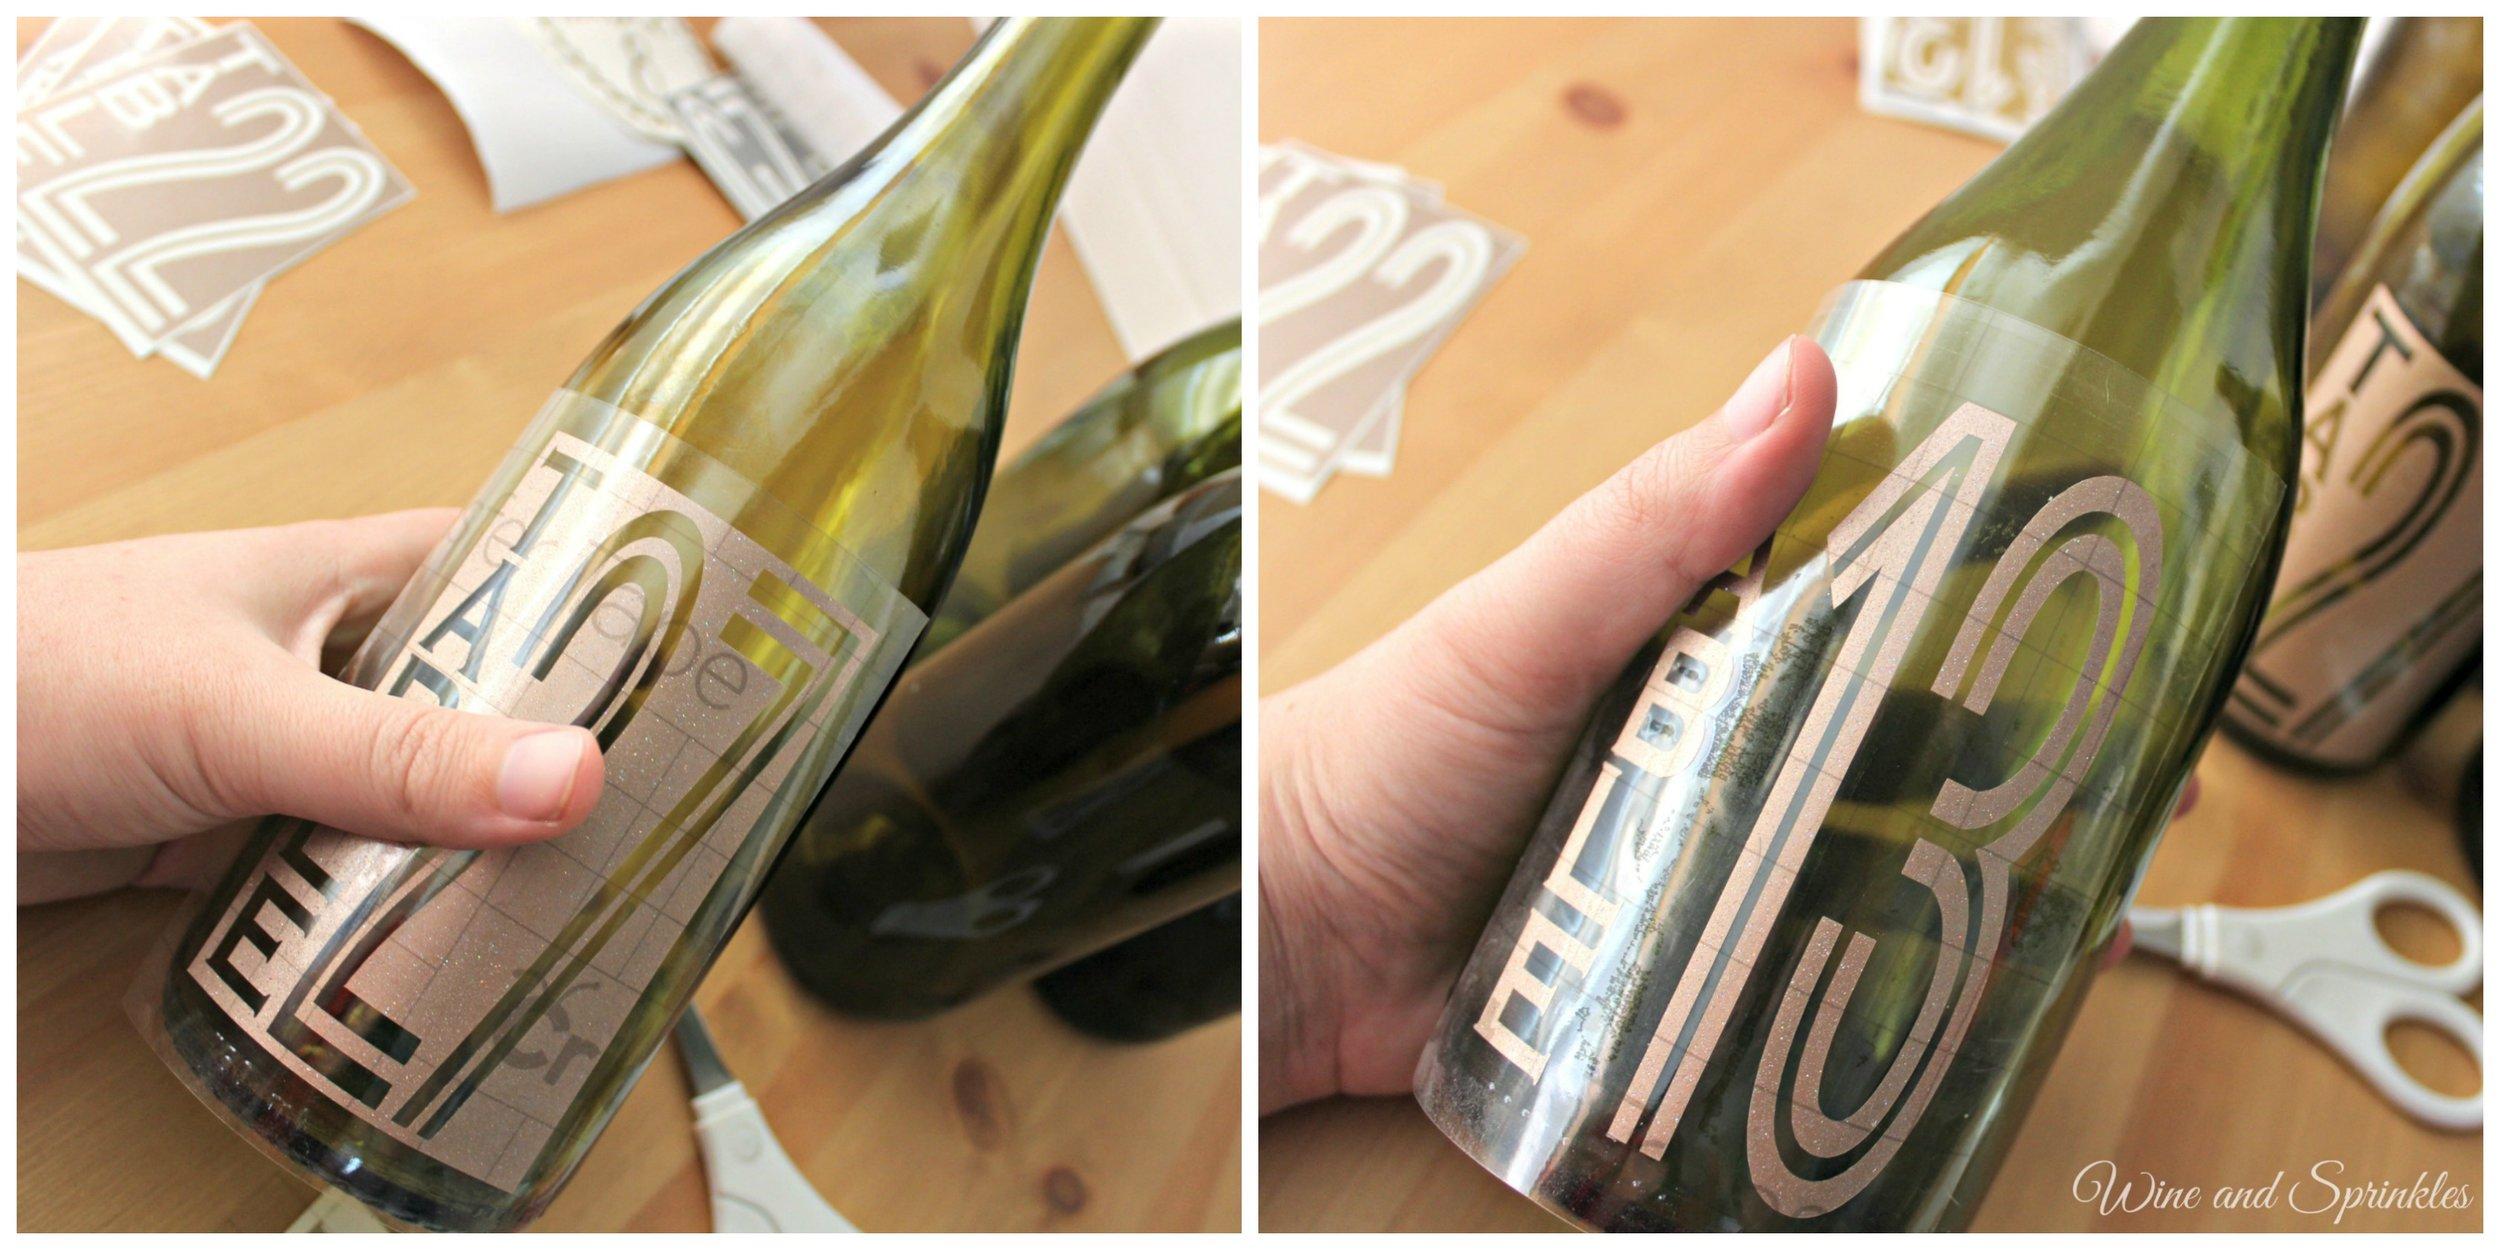 DIY Vinyl Modern Wine Bottle Table Numbers - Free Cut Files! #cricutprojects #diywedding #tablenumbers